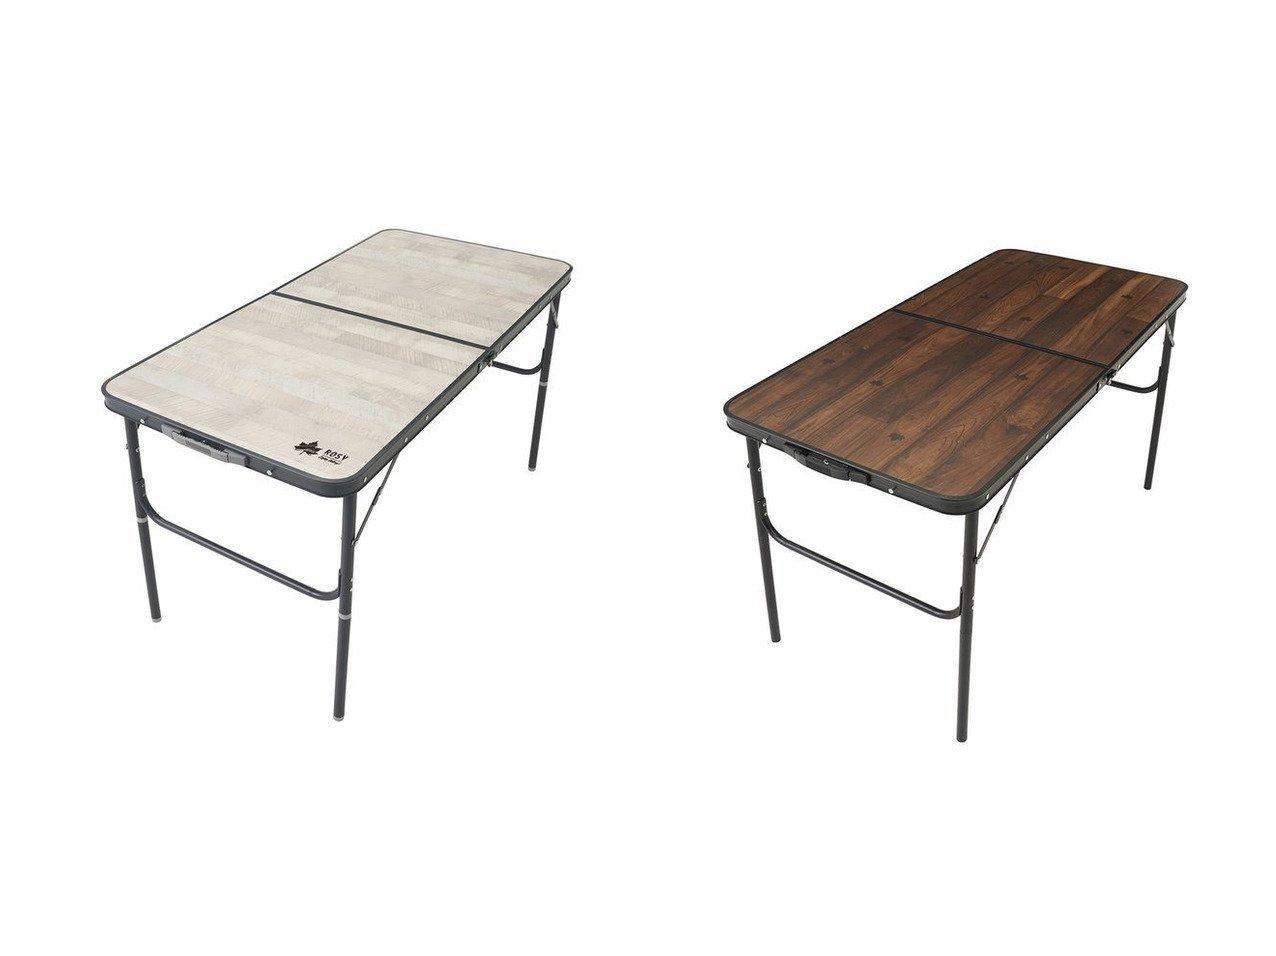 【LOGOS/ロゴス】の2021年新商品 ROSY ファミリーテーブル&2021年新商品 Tracksleeper テーブル 【アウトドアテーブル】おすすめ!人気キャンプ・アウトドア用品の通販 おすすめで人気の流行・トレンド、ファッションの通販商品 インテリア・家具・メンズファッション・キッズファッション・レディースファッション・服の通販 founy(ファニー) https://founy.com/ アウトドア スタンド テーブル パターン フレーム プリント ホーム・キャンプ・アウトドア Home,Garden,Outdoor,Camping Gear キャンプ用品・アウトドア  Camping Gear & Outdoor Supplies チェア テーブル Camp Chairs, Camping Tables |ID:crp329100000050849